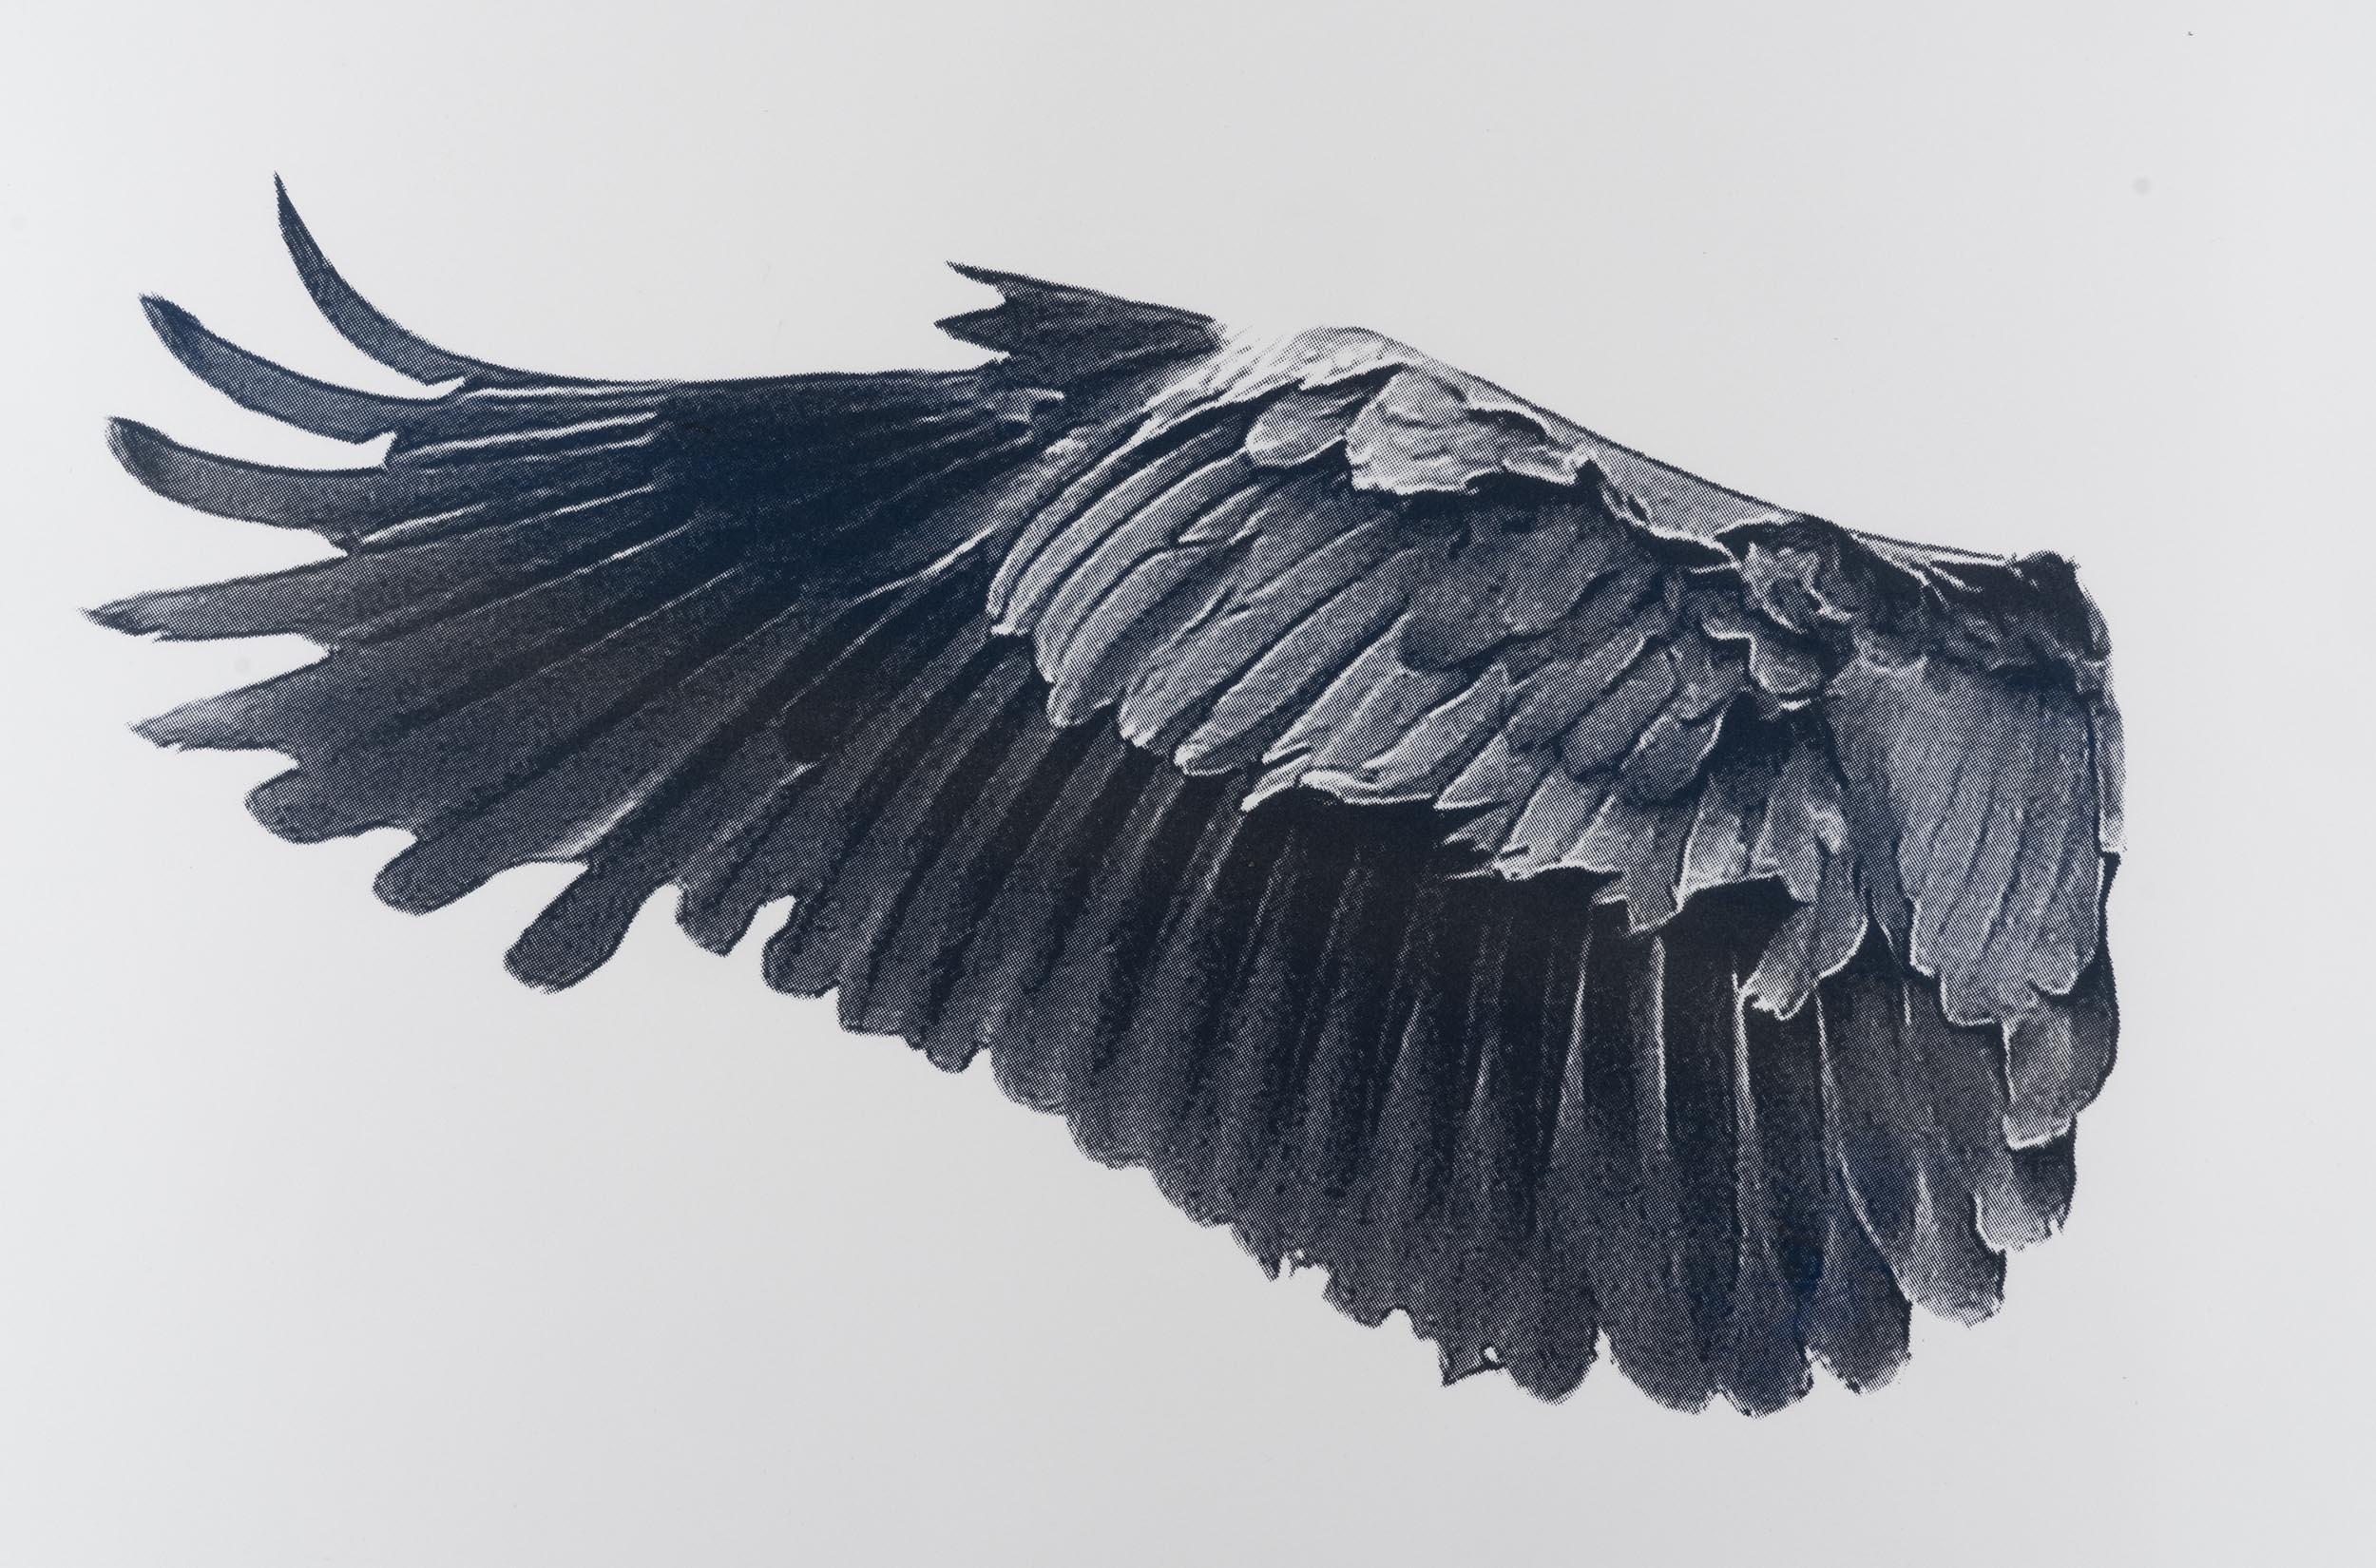 Eve-Biddle-Artworks-Dutchess-Heron-Wing-gunmetal-2016-02